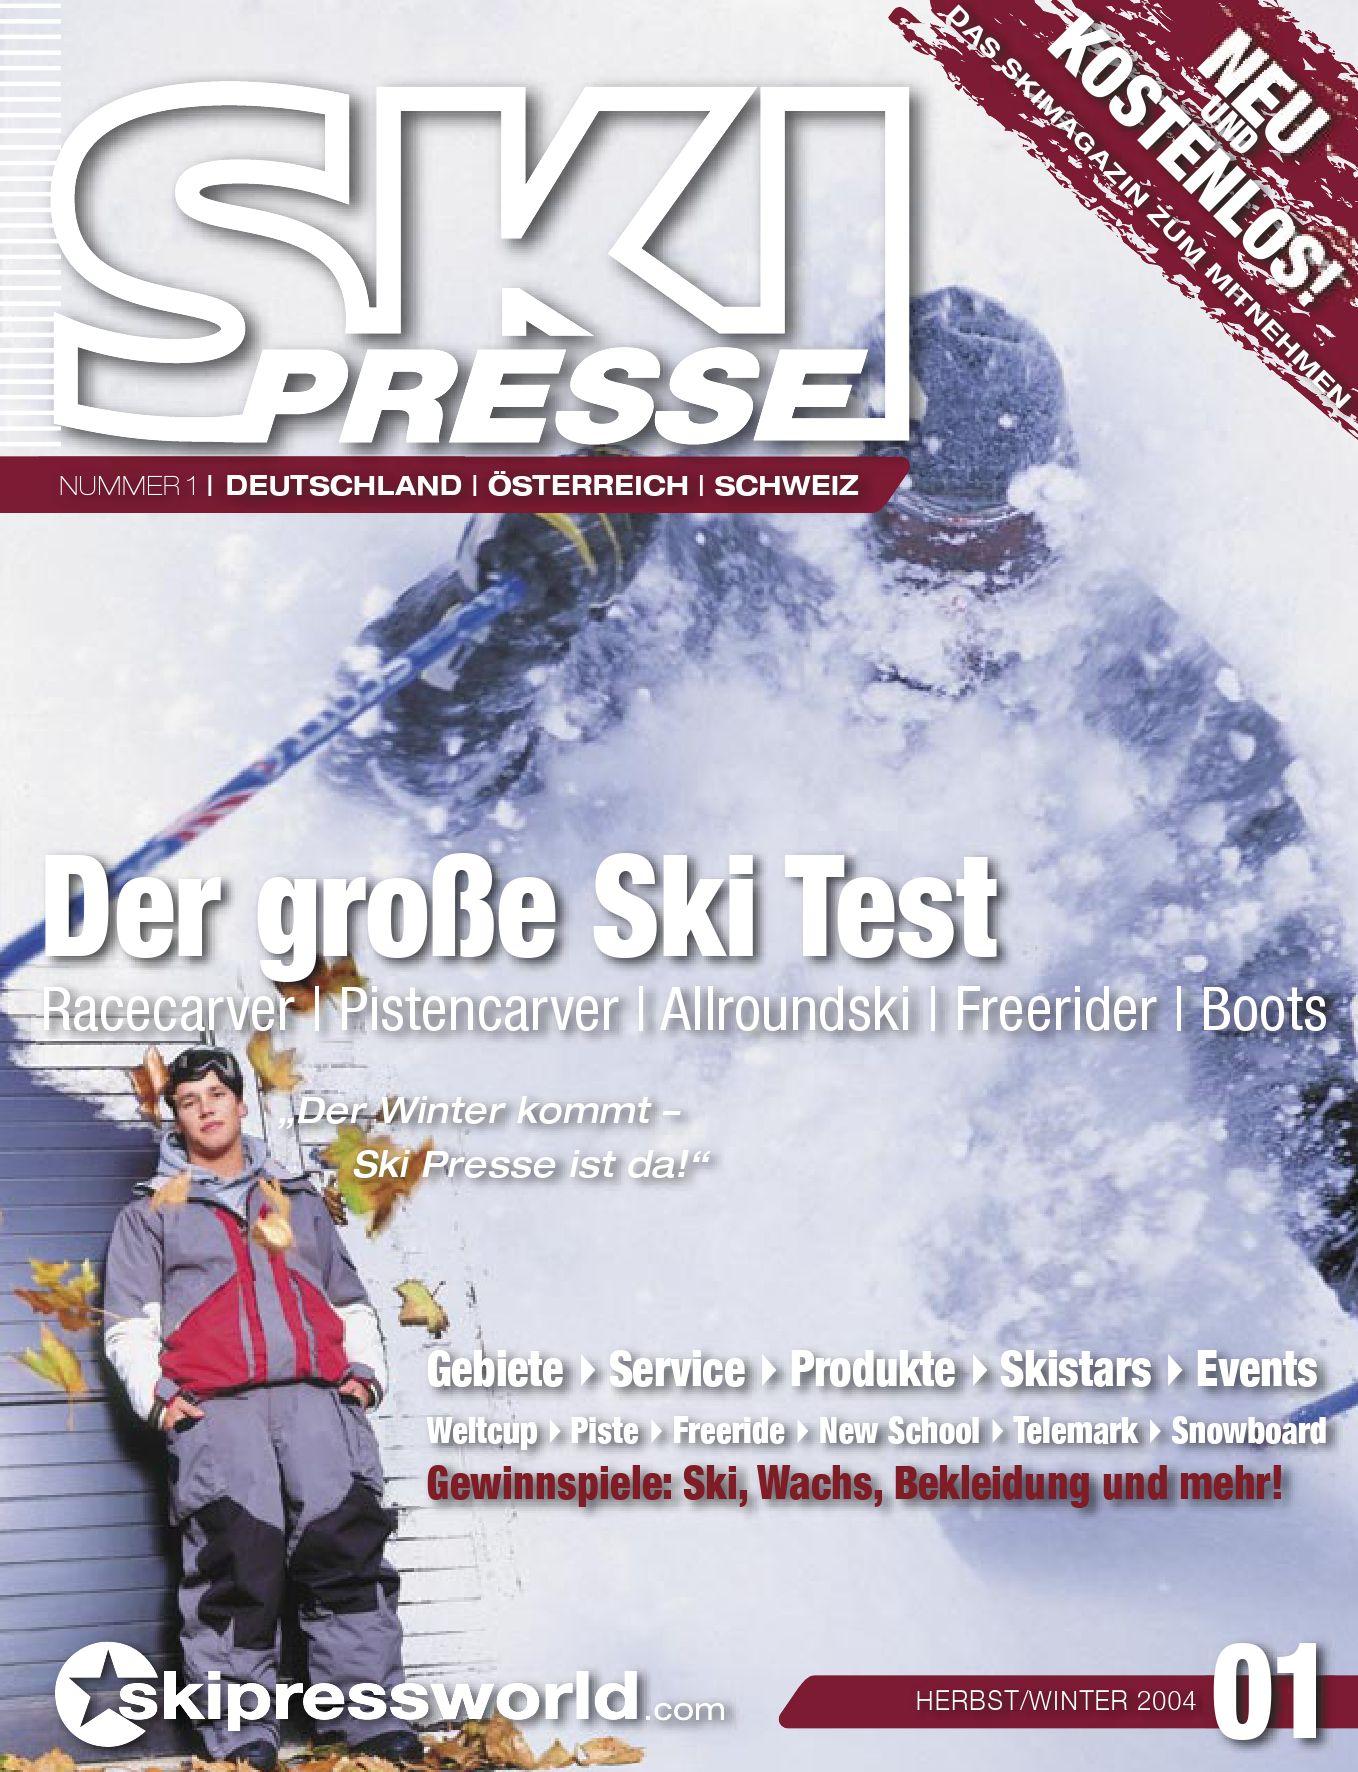 SkiPresse Nr. 1 by die denkbar Wolfgang Greiner issuu